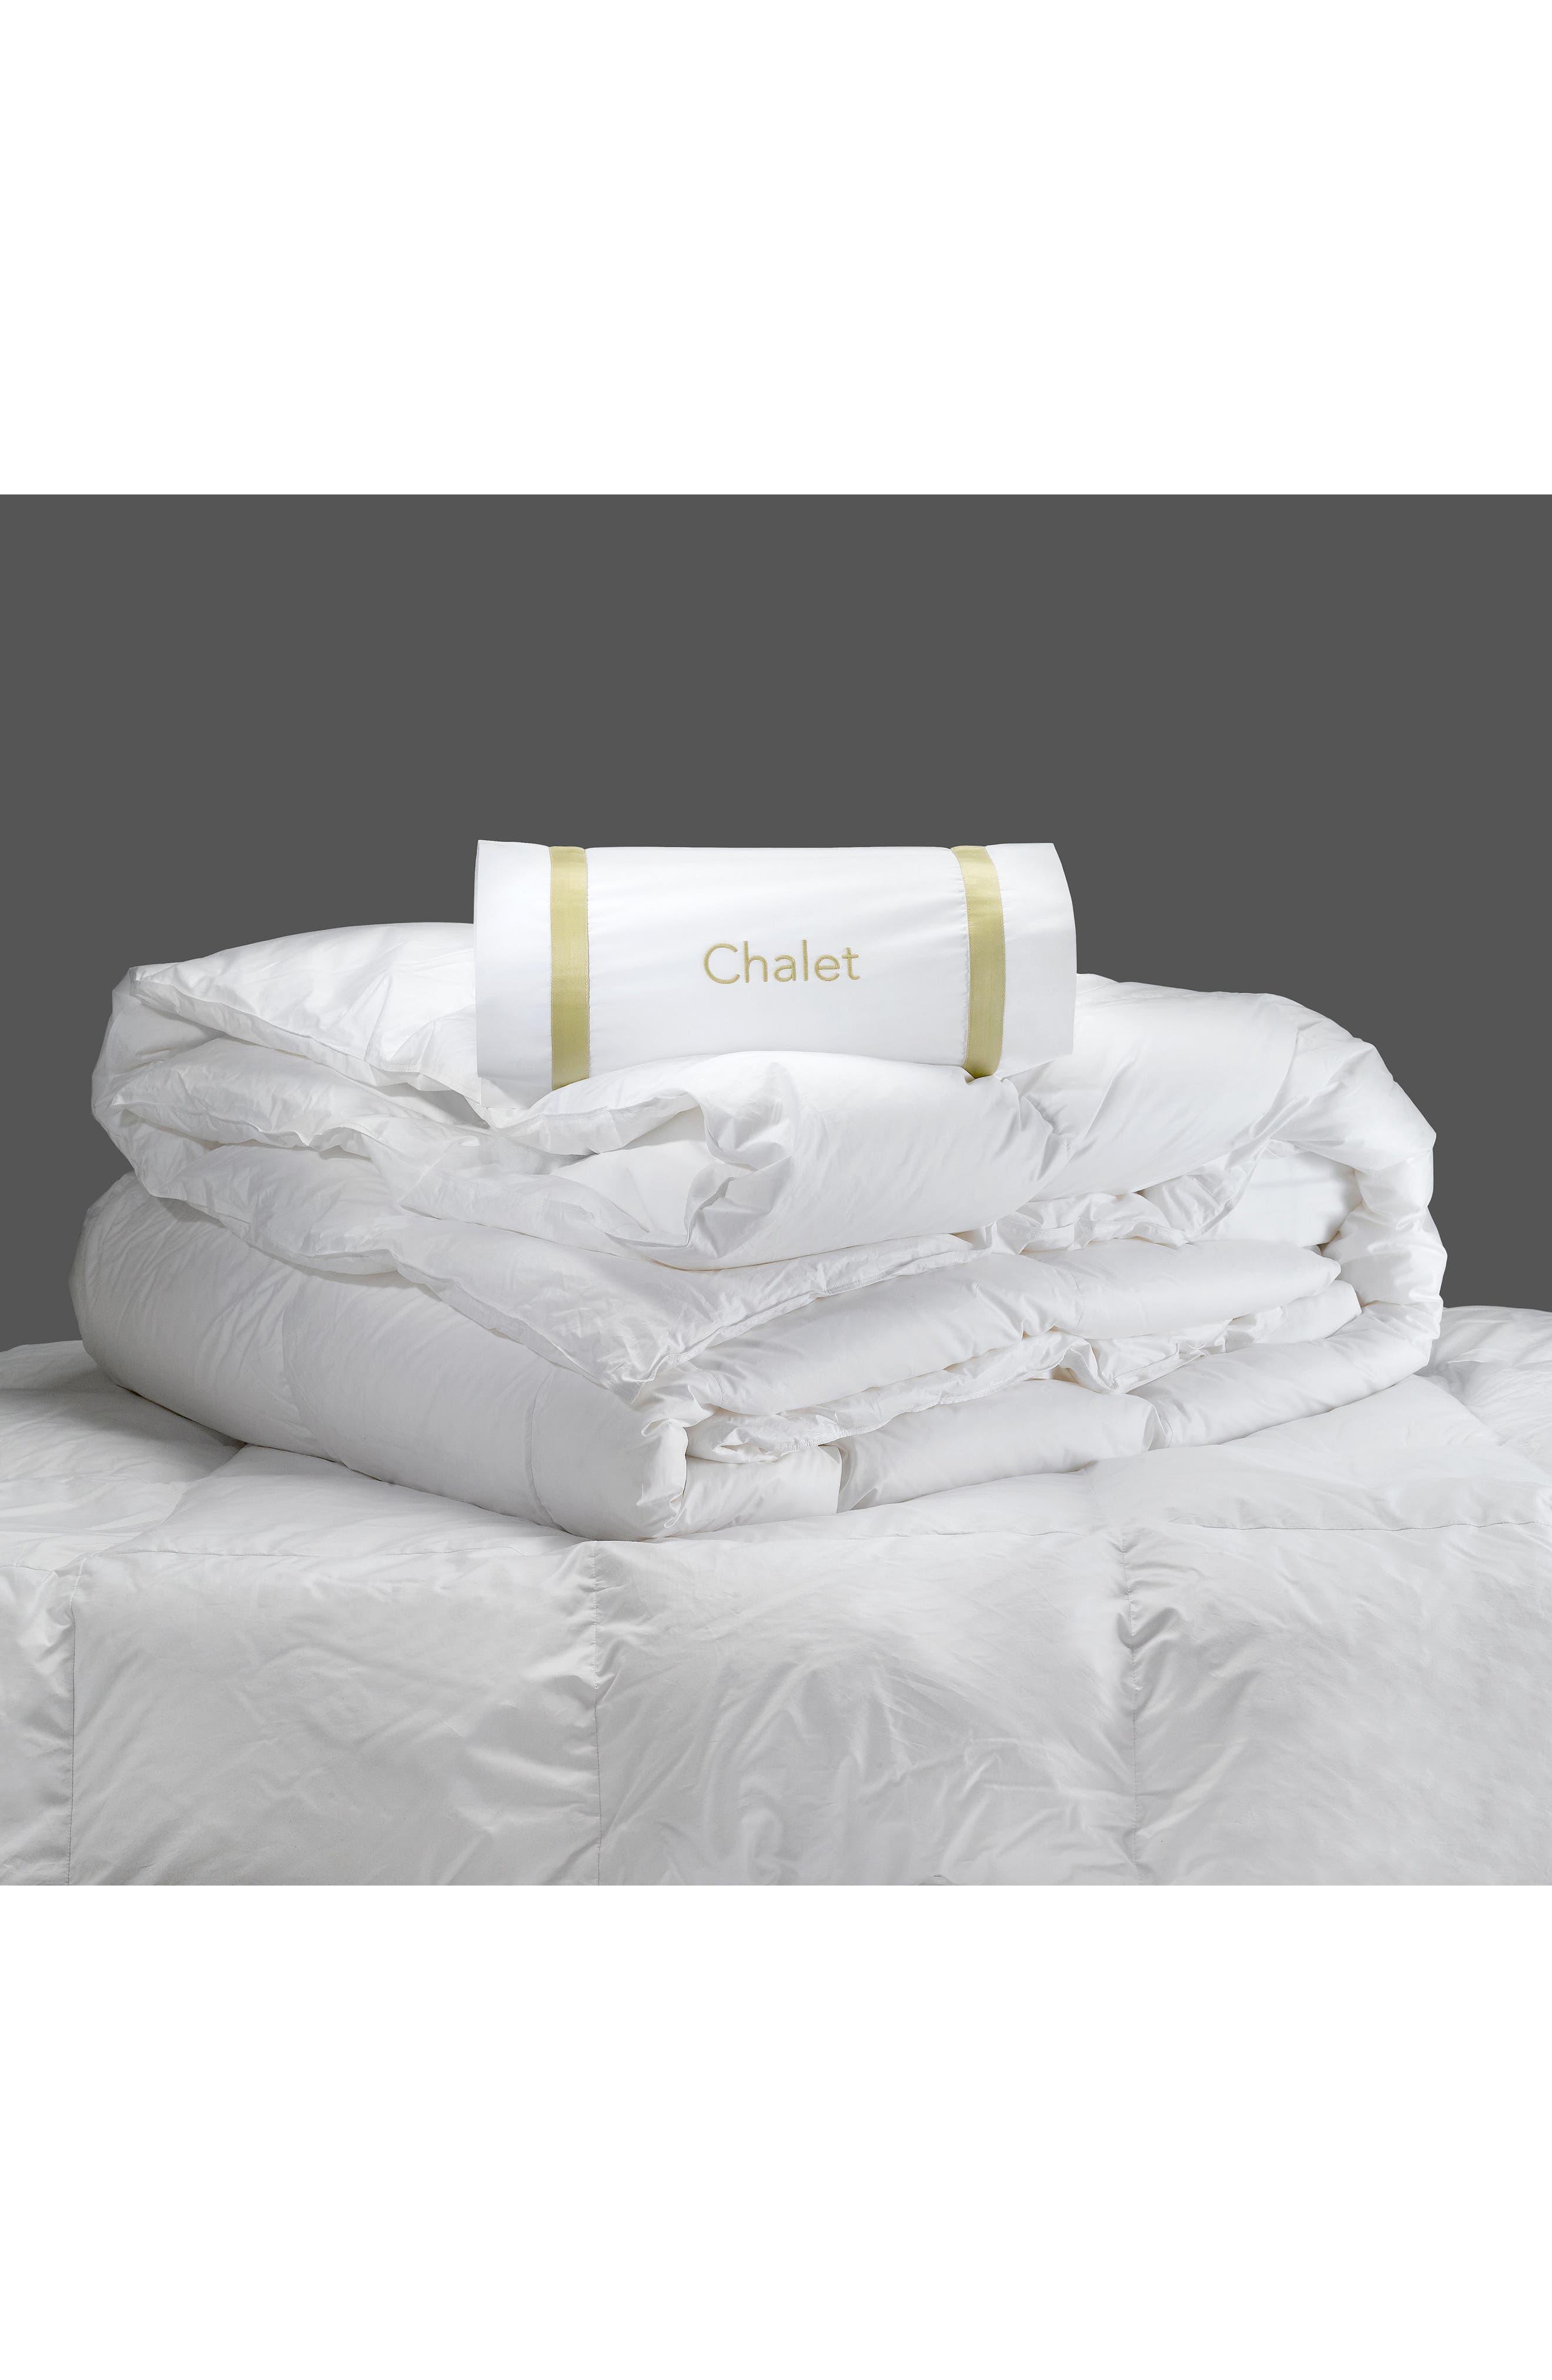 Chalet 800 Fill Power 380 Thread Count All Season Down Comforter,                             Alternate thumbnail 2, color,                             White